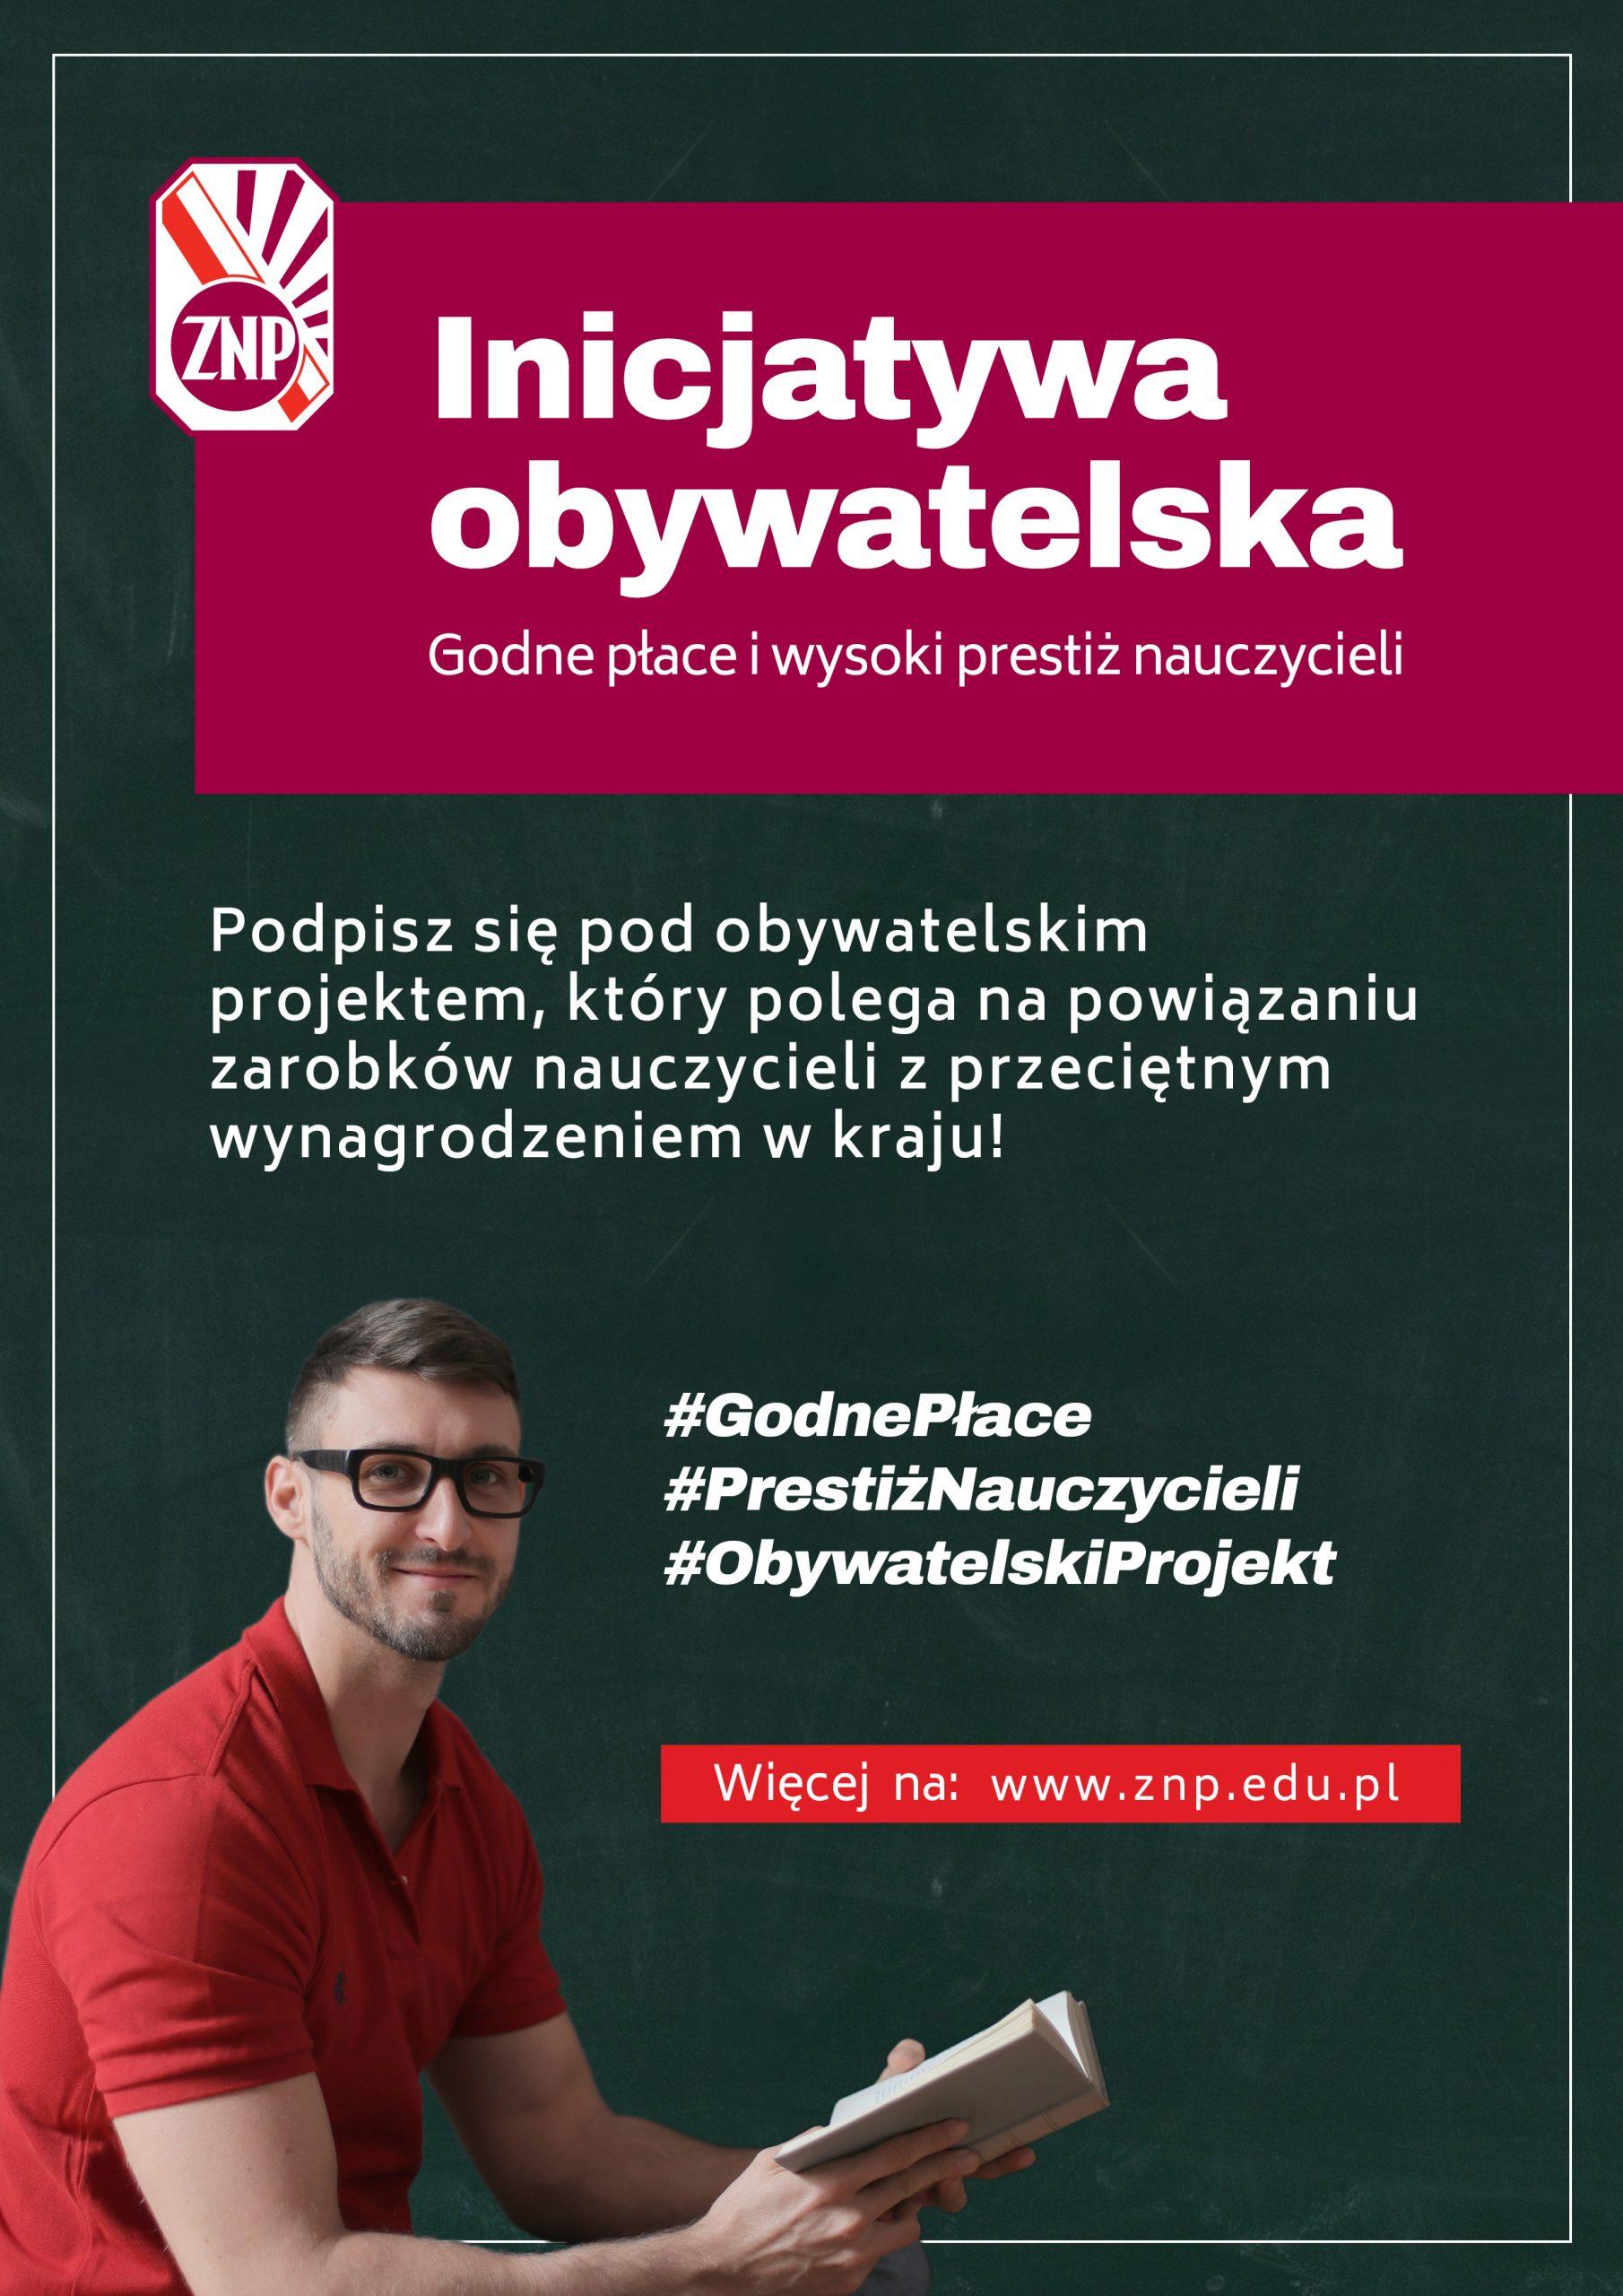 znp_plakat_A4_inicjatywa_obywatelska-2-scaled